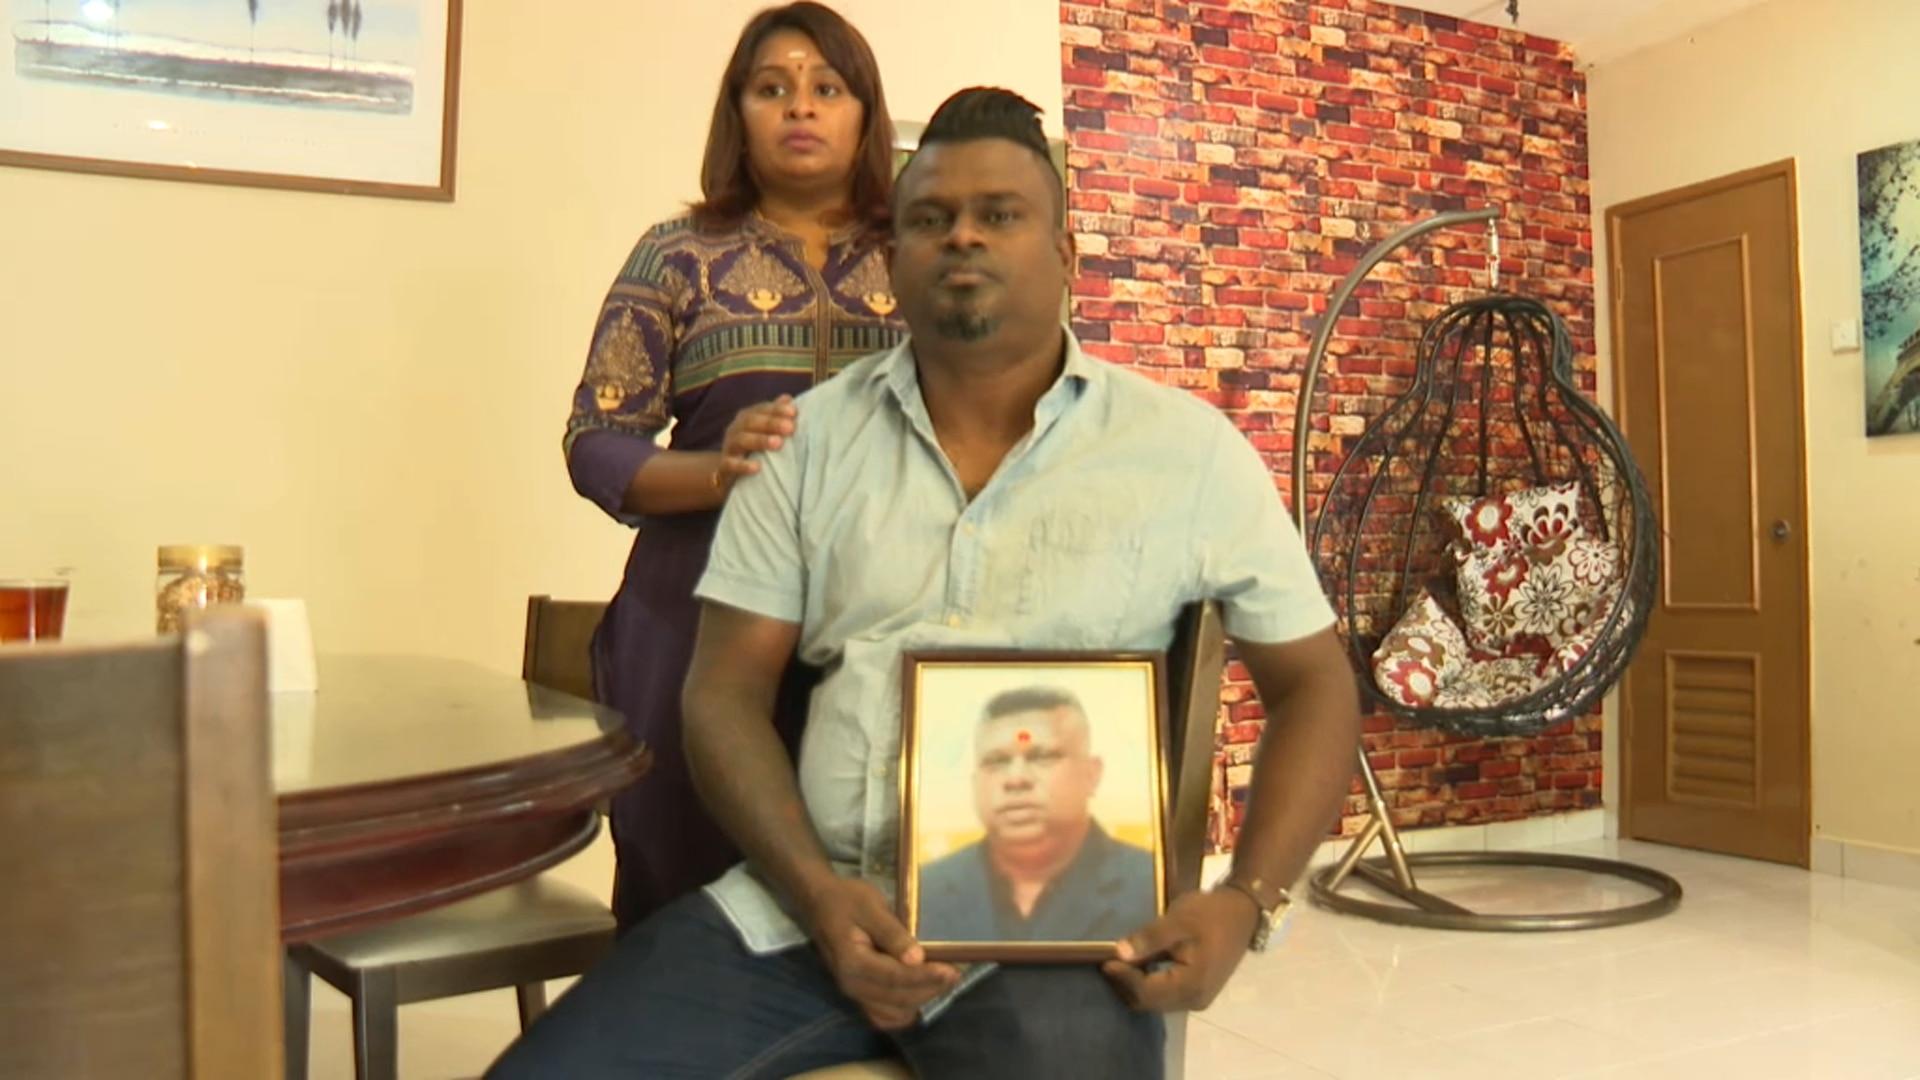 Balraj Suppiah and his wife Ganeshwari Moorthy